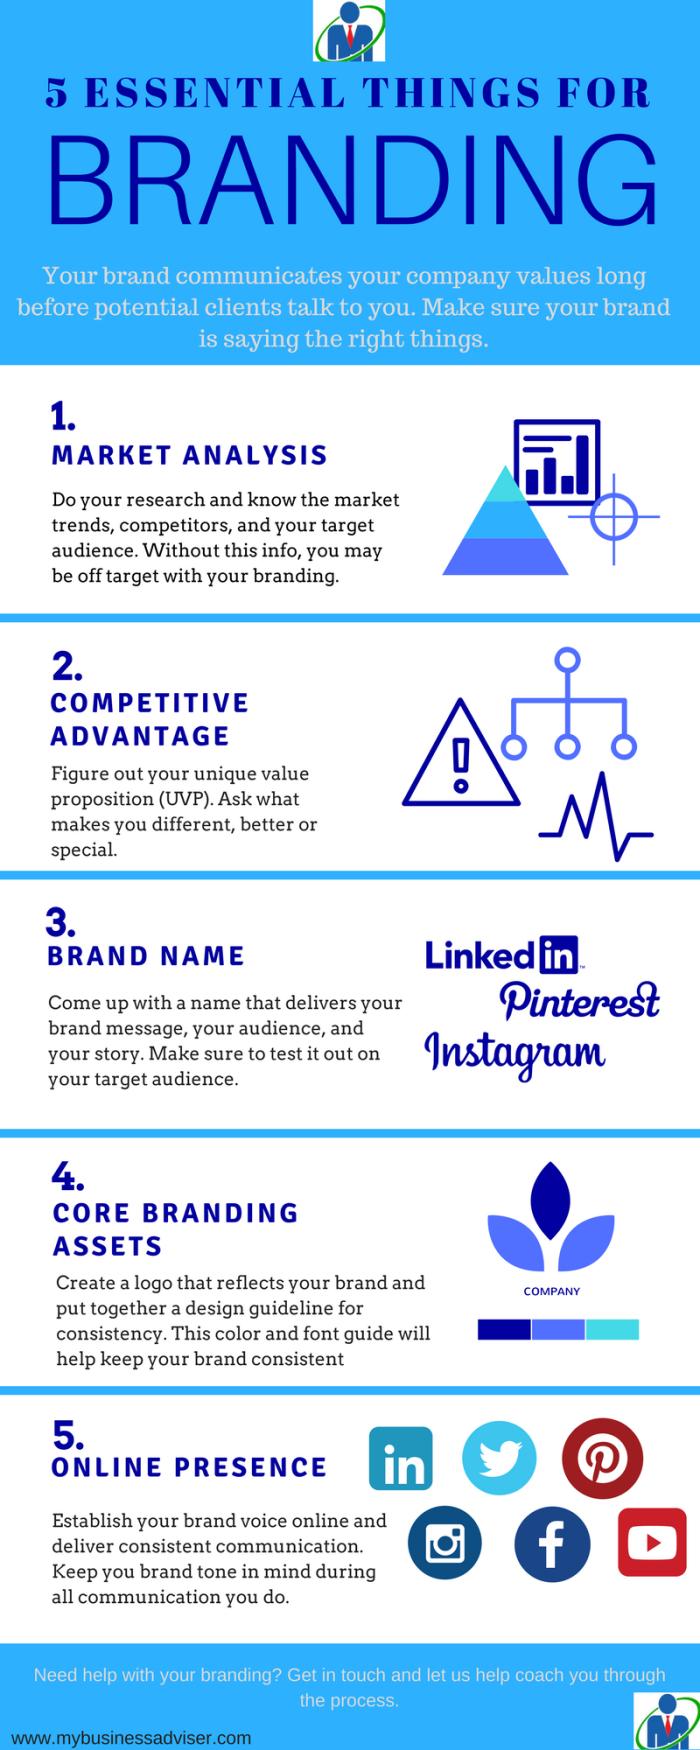 Essential things for Branding